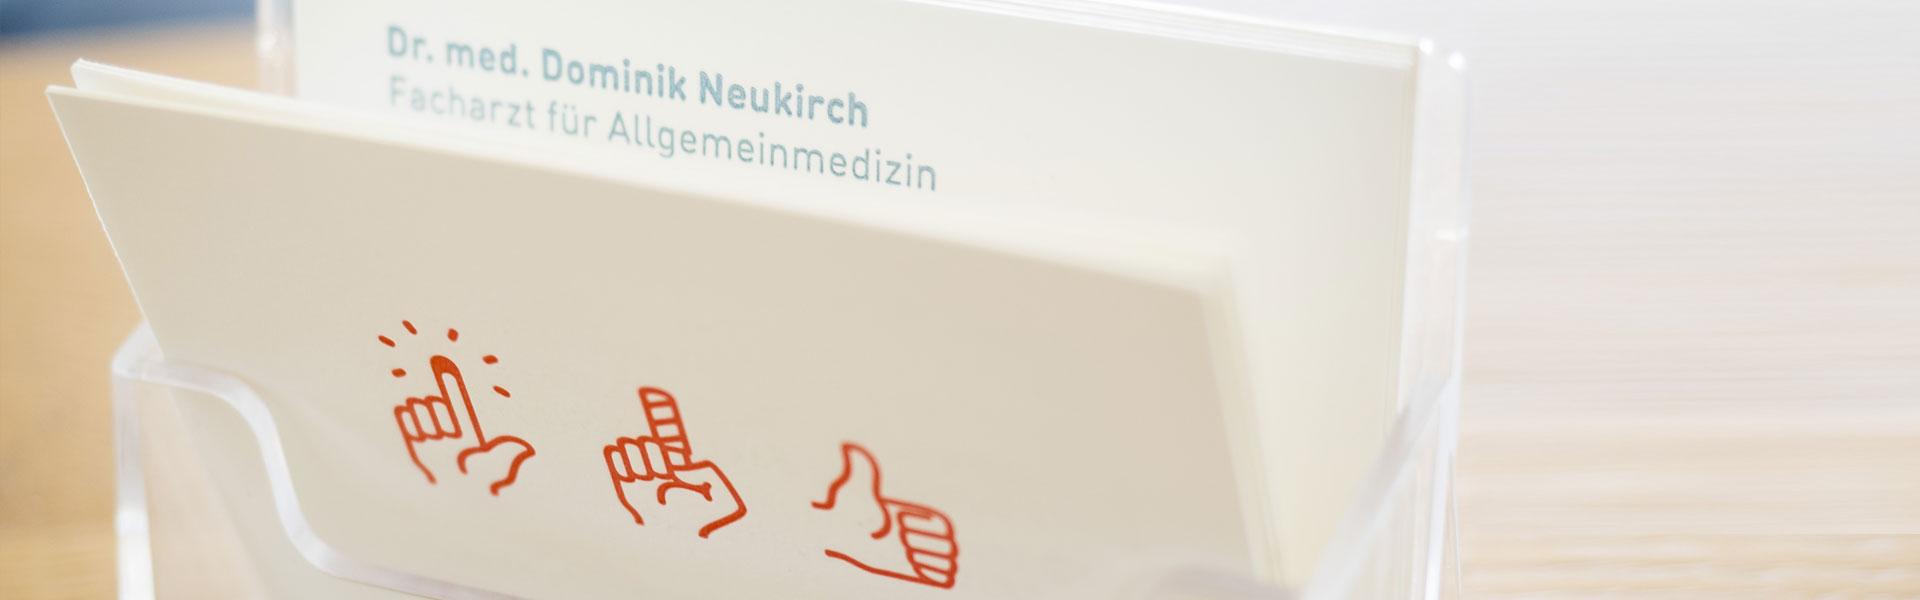 Kontakt Praxis Dr. med. Dominik Neukirch